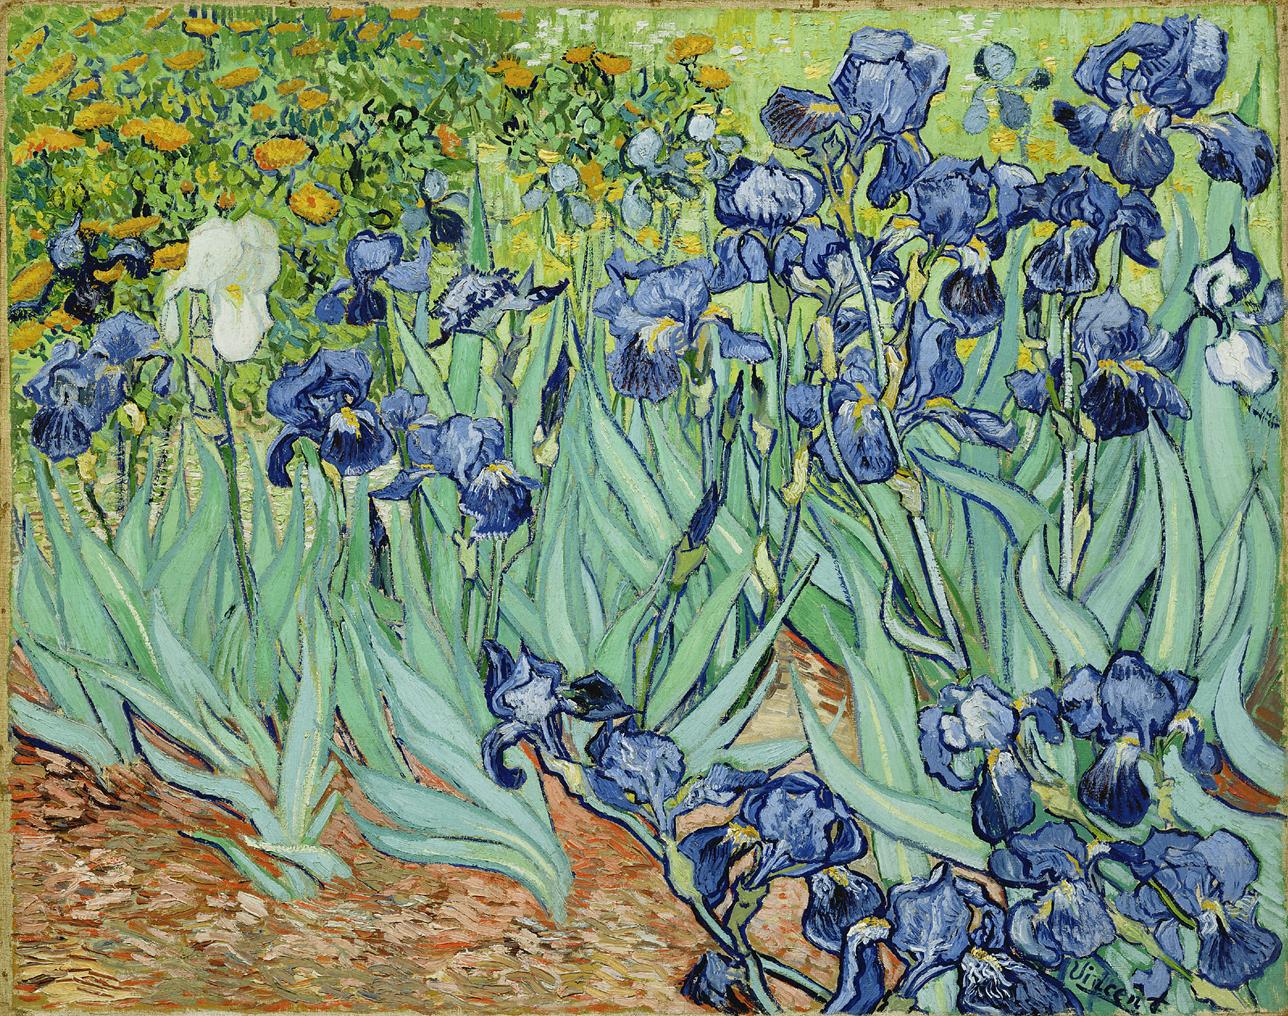 The Fine Art Diner Van Gogh The Spiritual Struggle Of Irises